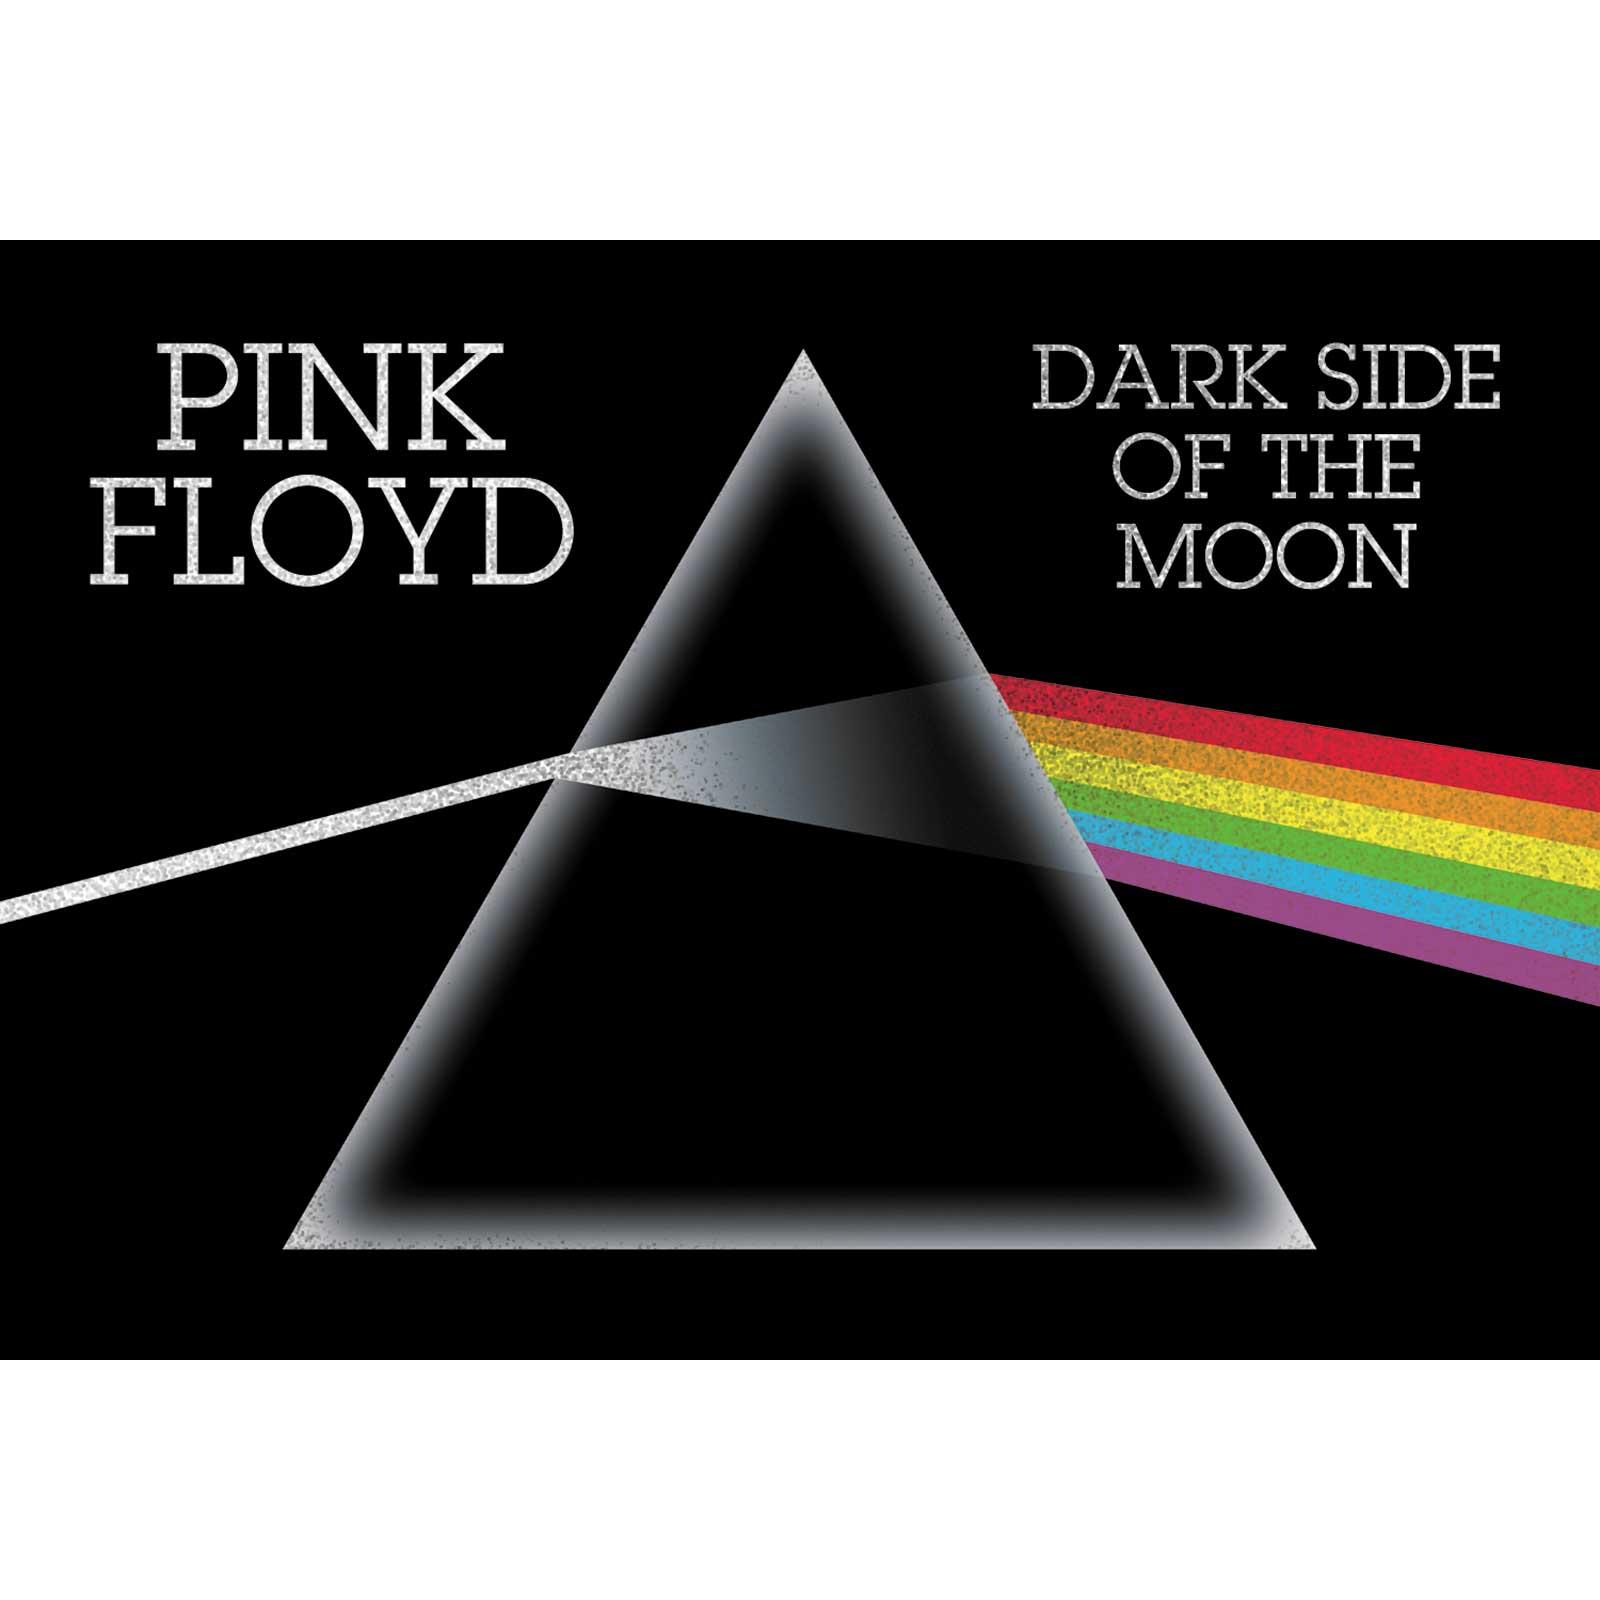 "Pink Floyd DSOM 5""x3.5"" Glitter Sticker"